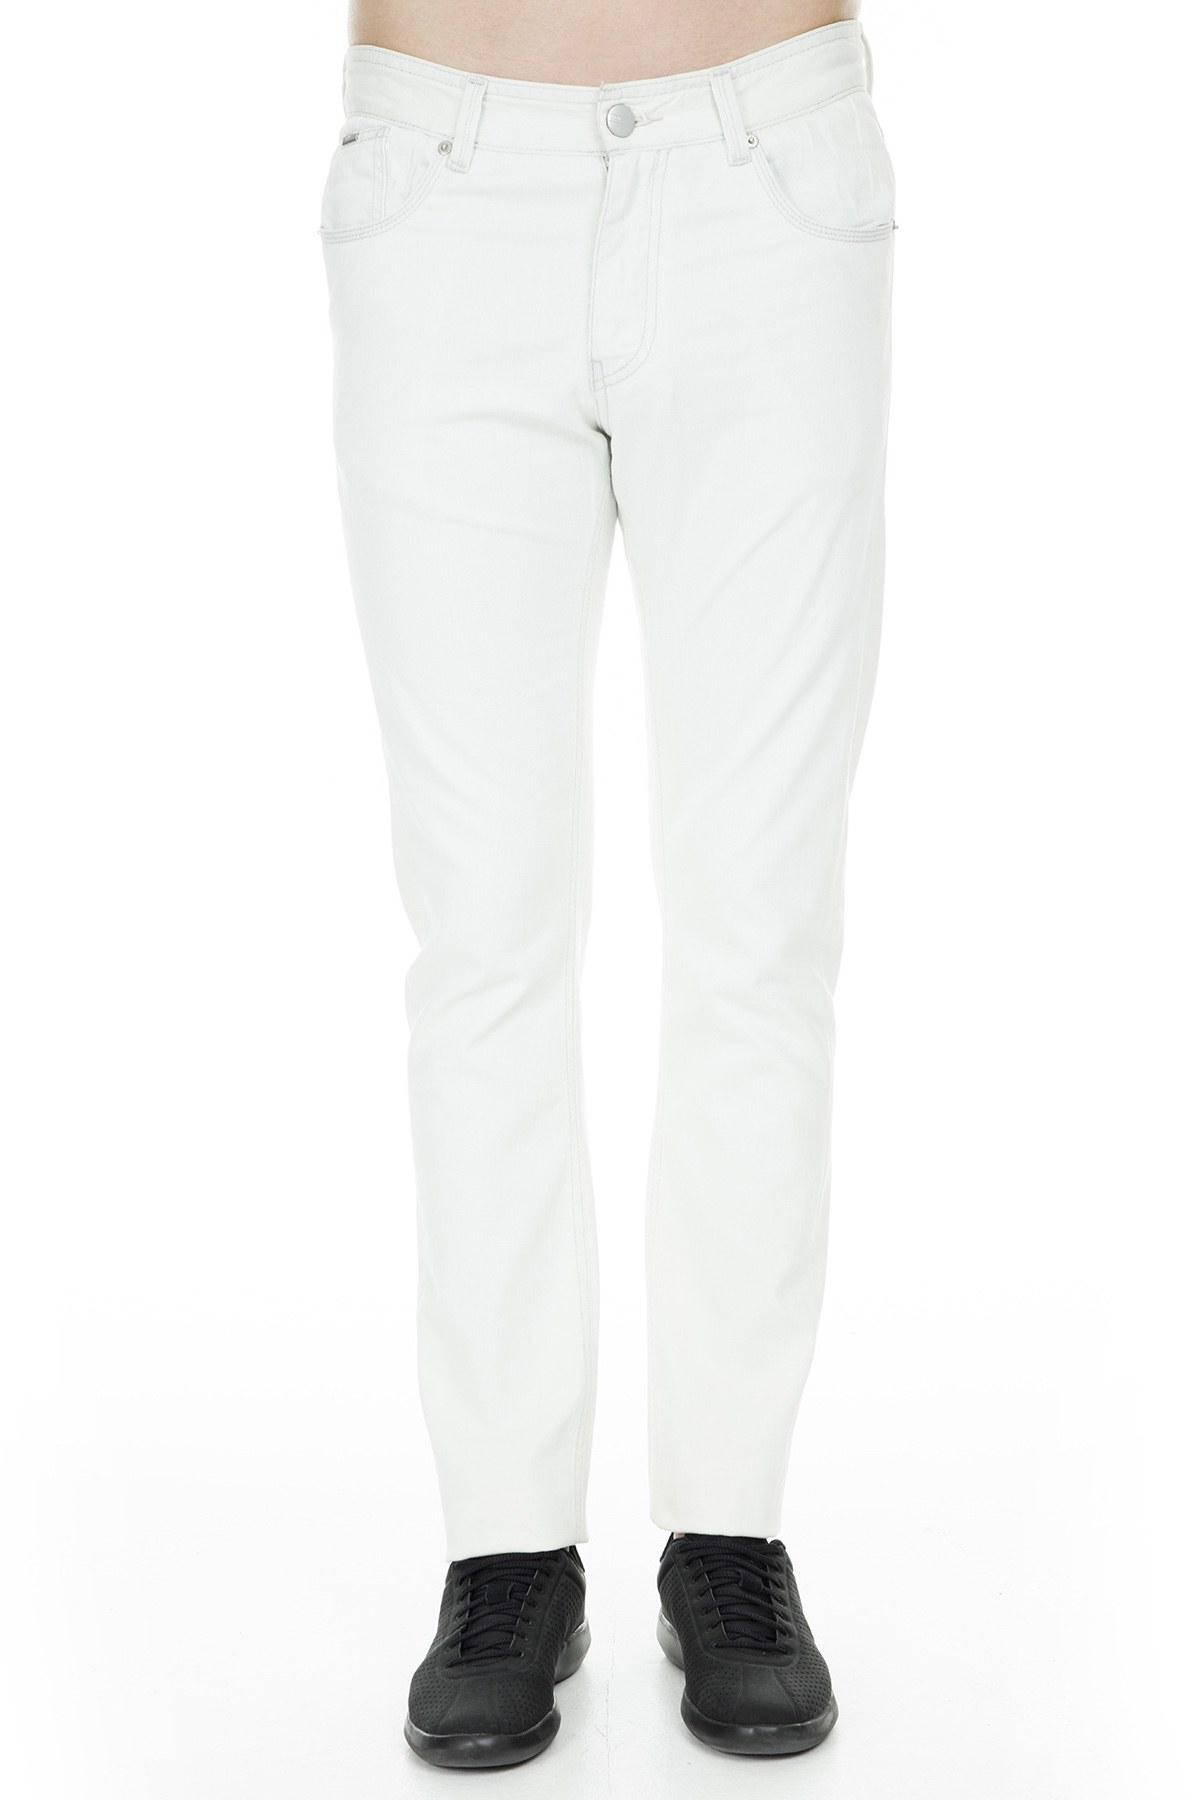 Armani Collezioni Jeans Erkek Kot Pantolon CIJ10 QA CAE